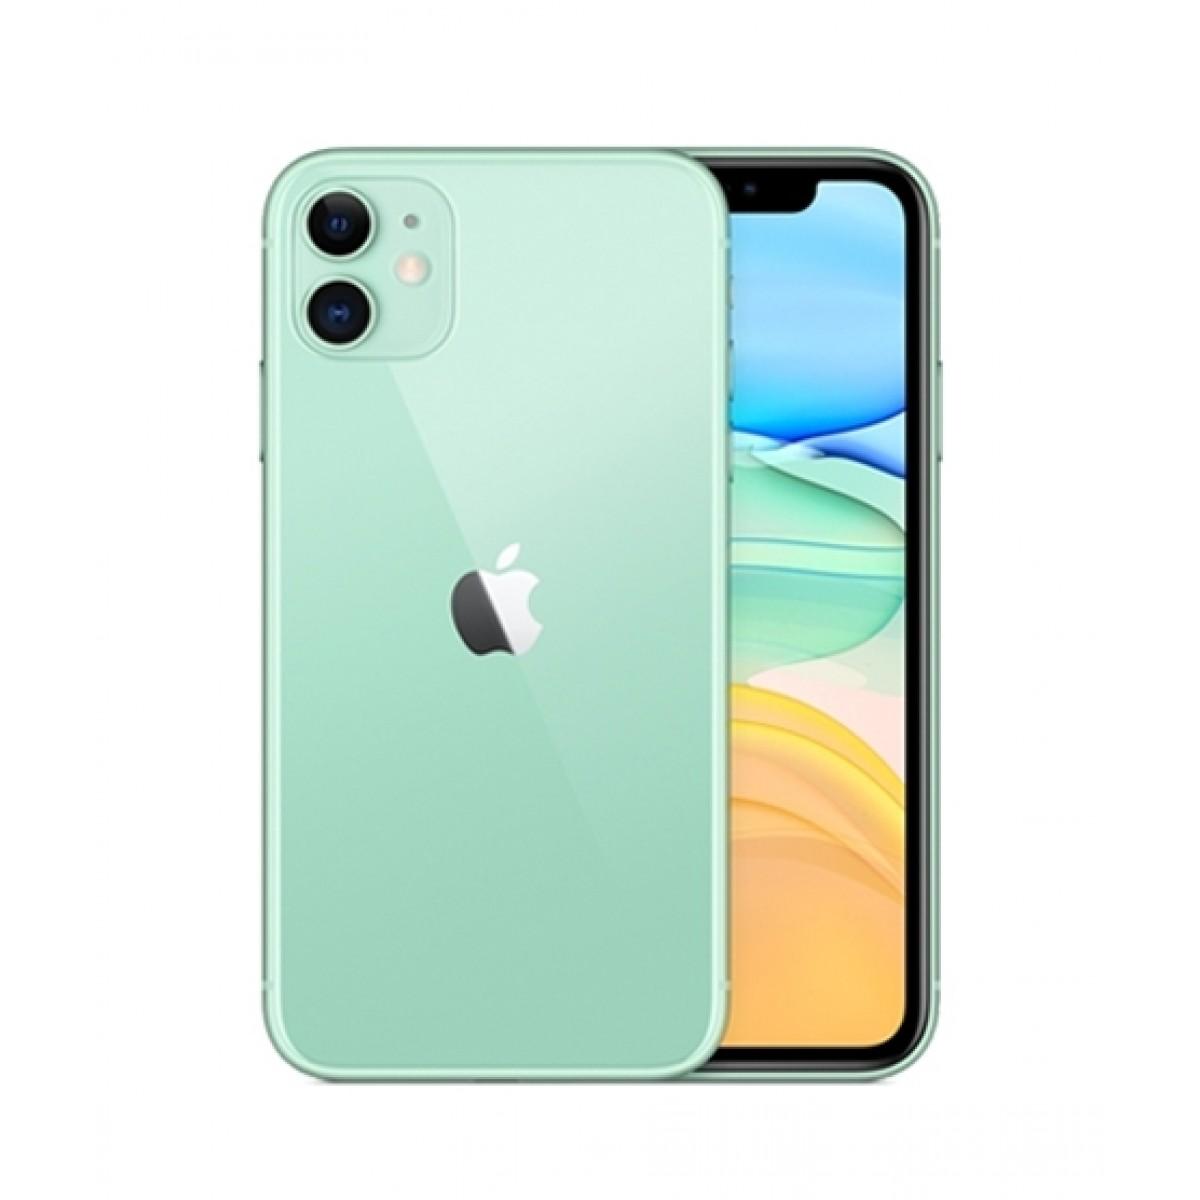 Apple iPhone 11 64GB Dual Sim Green - Non PTA Compliant